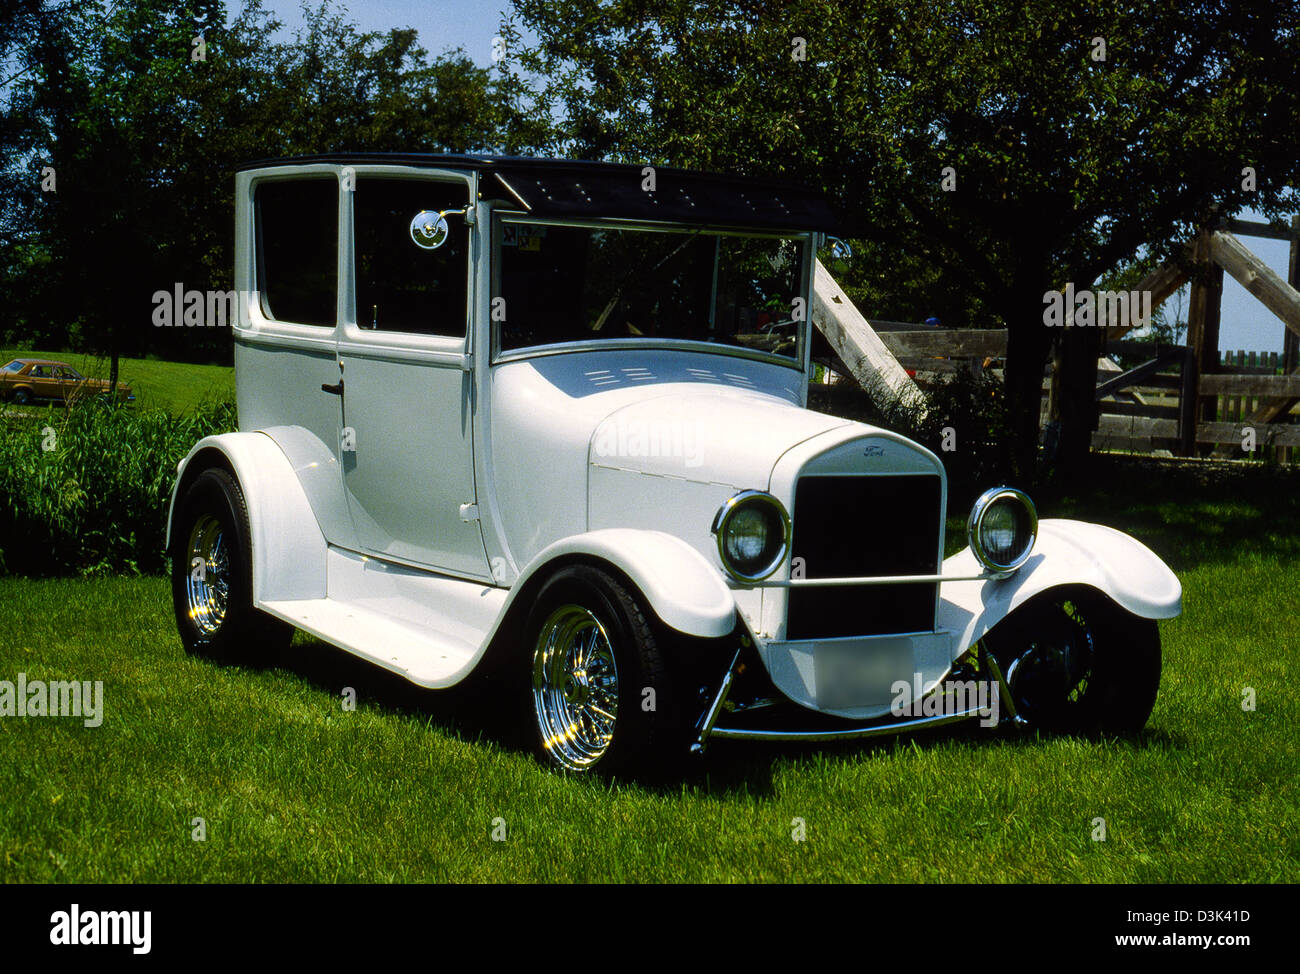 1926 Model T Ford Street Rod Stock Photo: 53895337 - Alamy